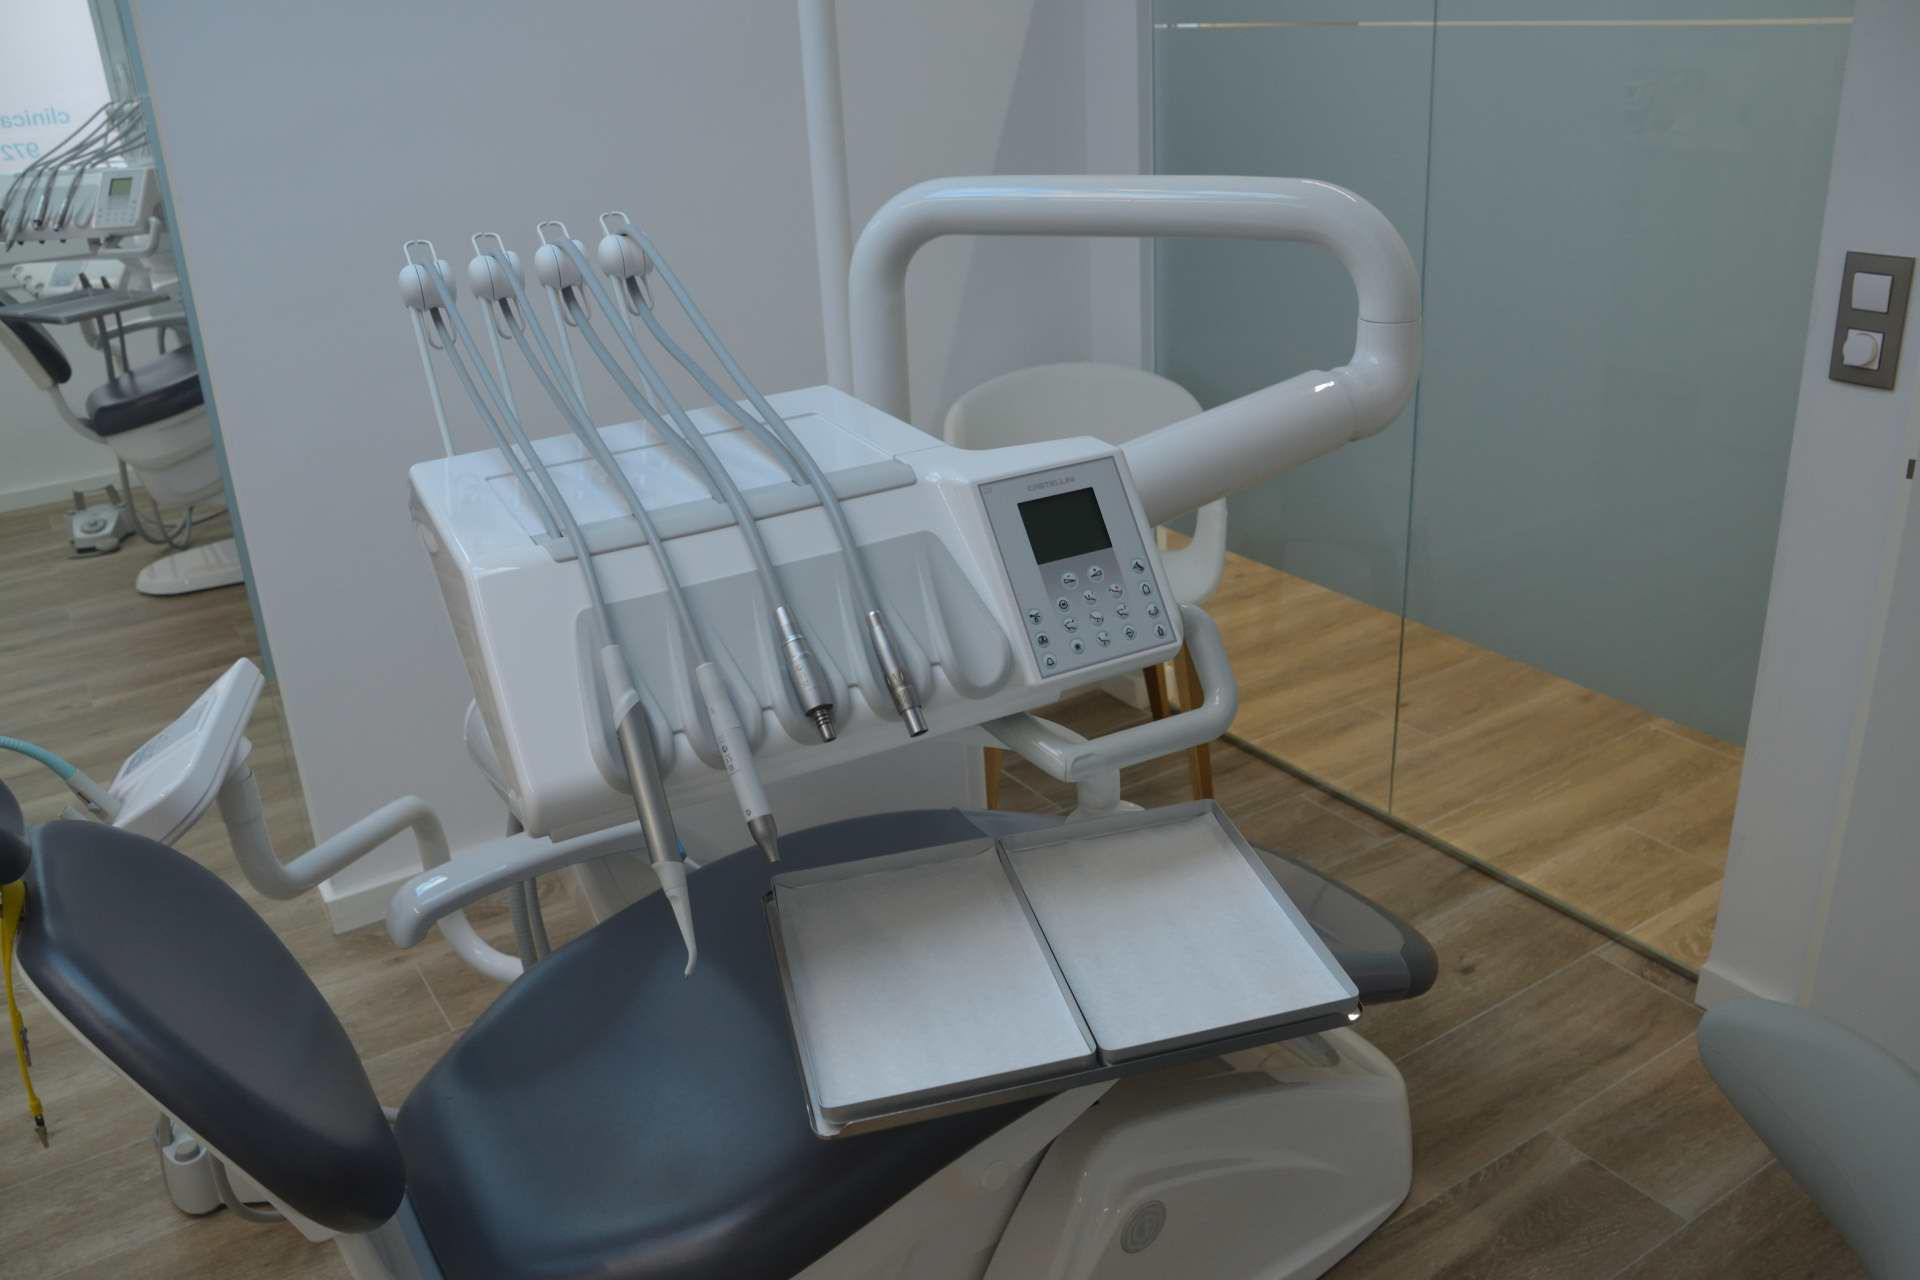 Implante Dental Salt